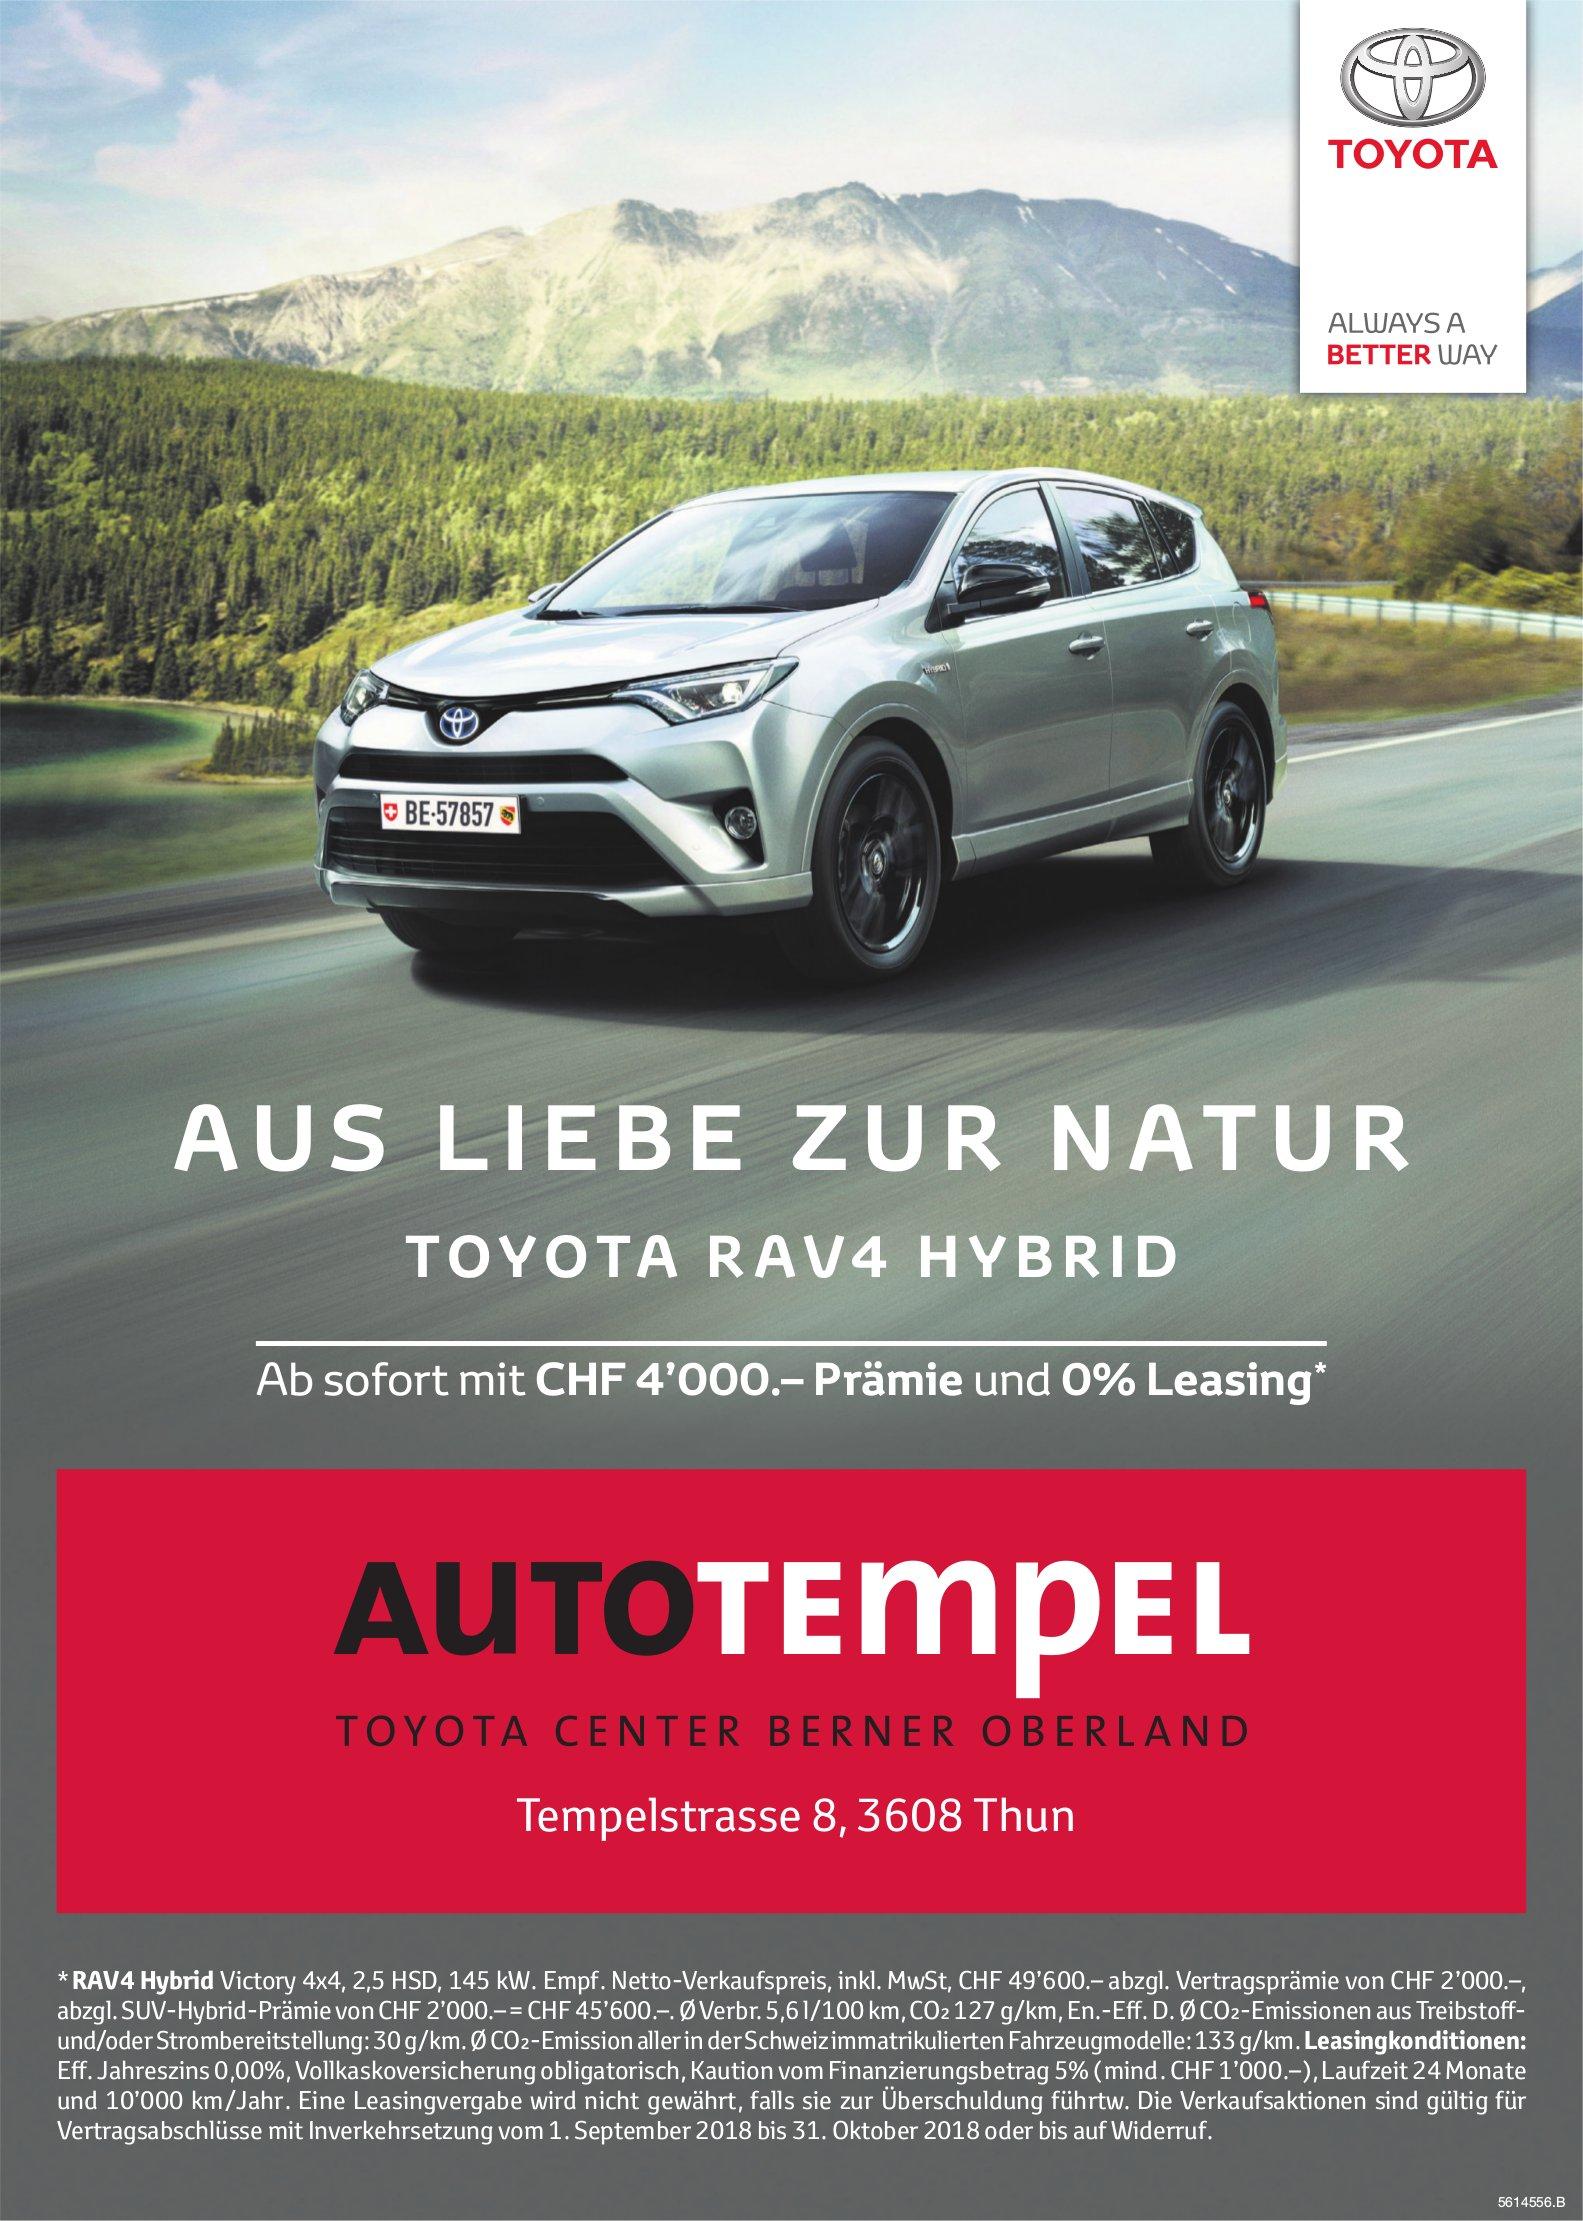 AUTOTEMPEL, Thun - TOYOTA RAV4 HYBRID